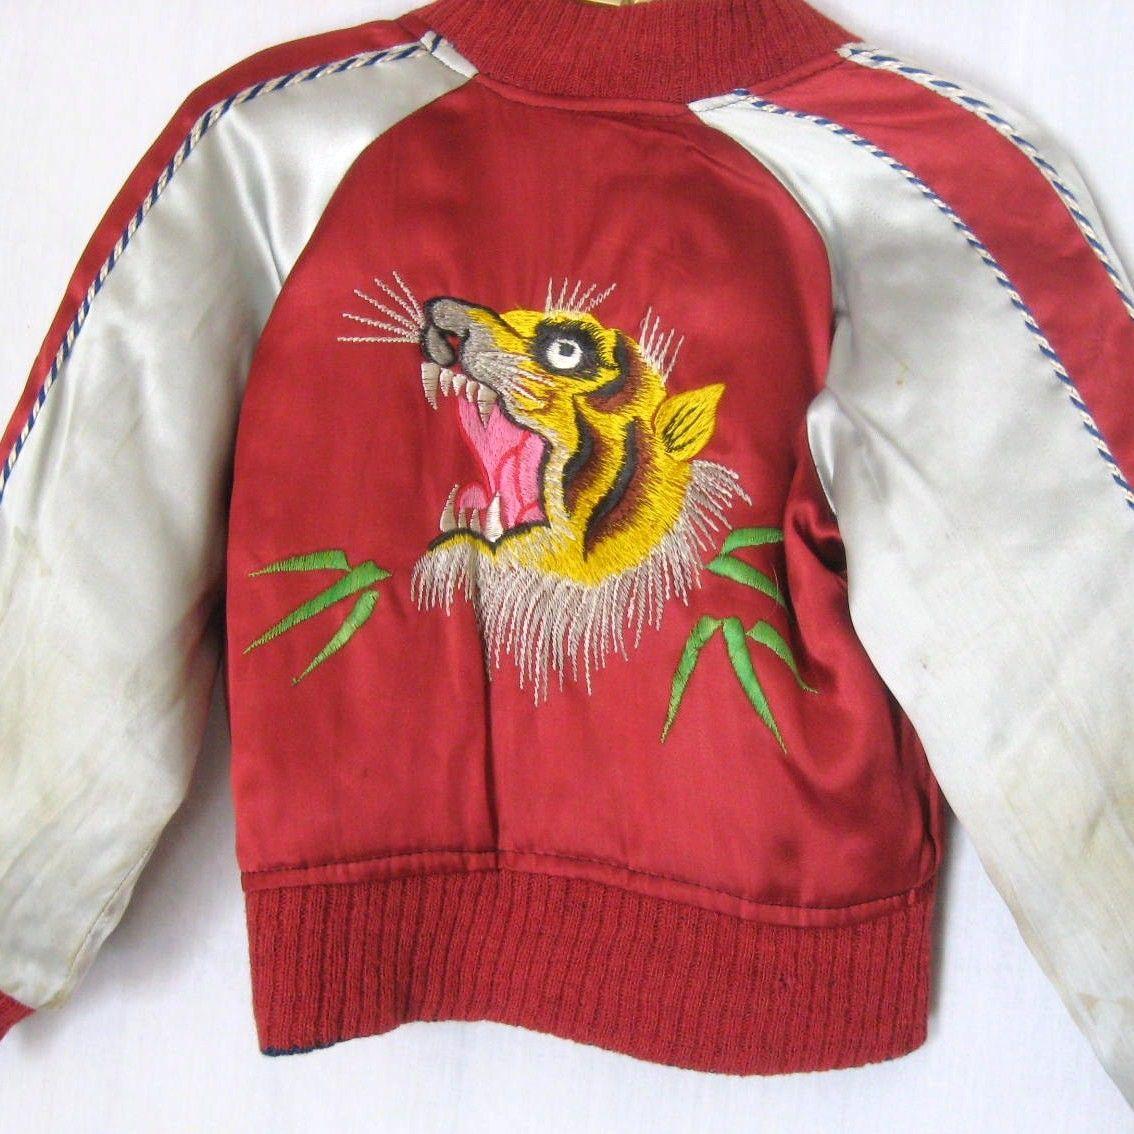 08226c0c34e0 40s 50s Vintage Souvenir Tour Jacket Reversible Tiger Eagle Embroidery  Quilted Satin Baseball Style Japan Korea Child Sz. $68.00, via Etsy.